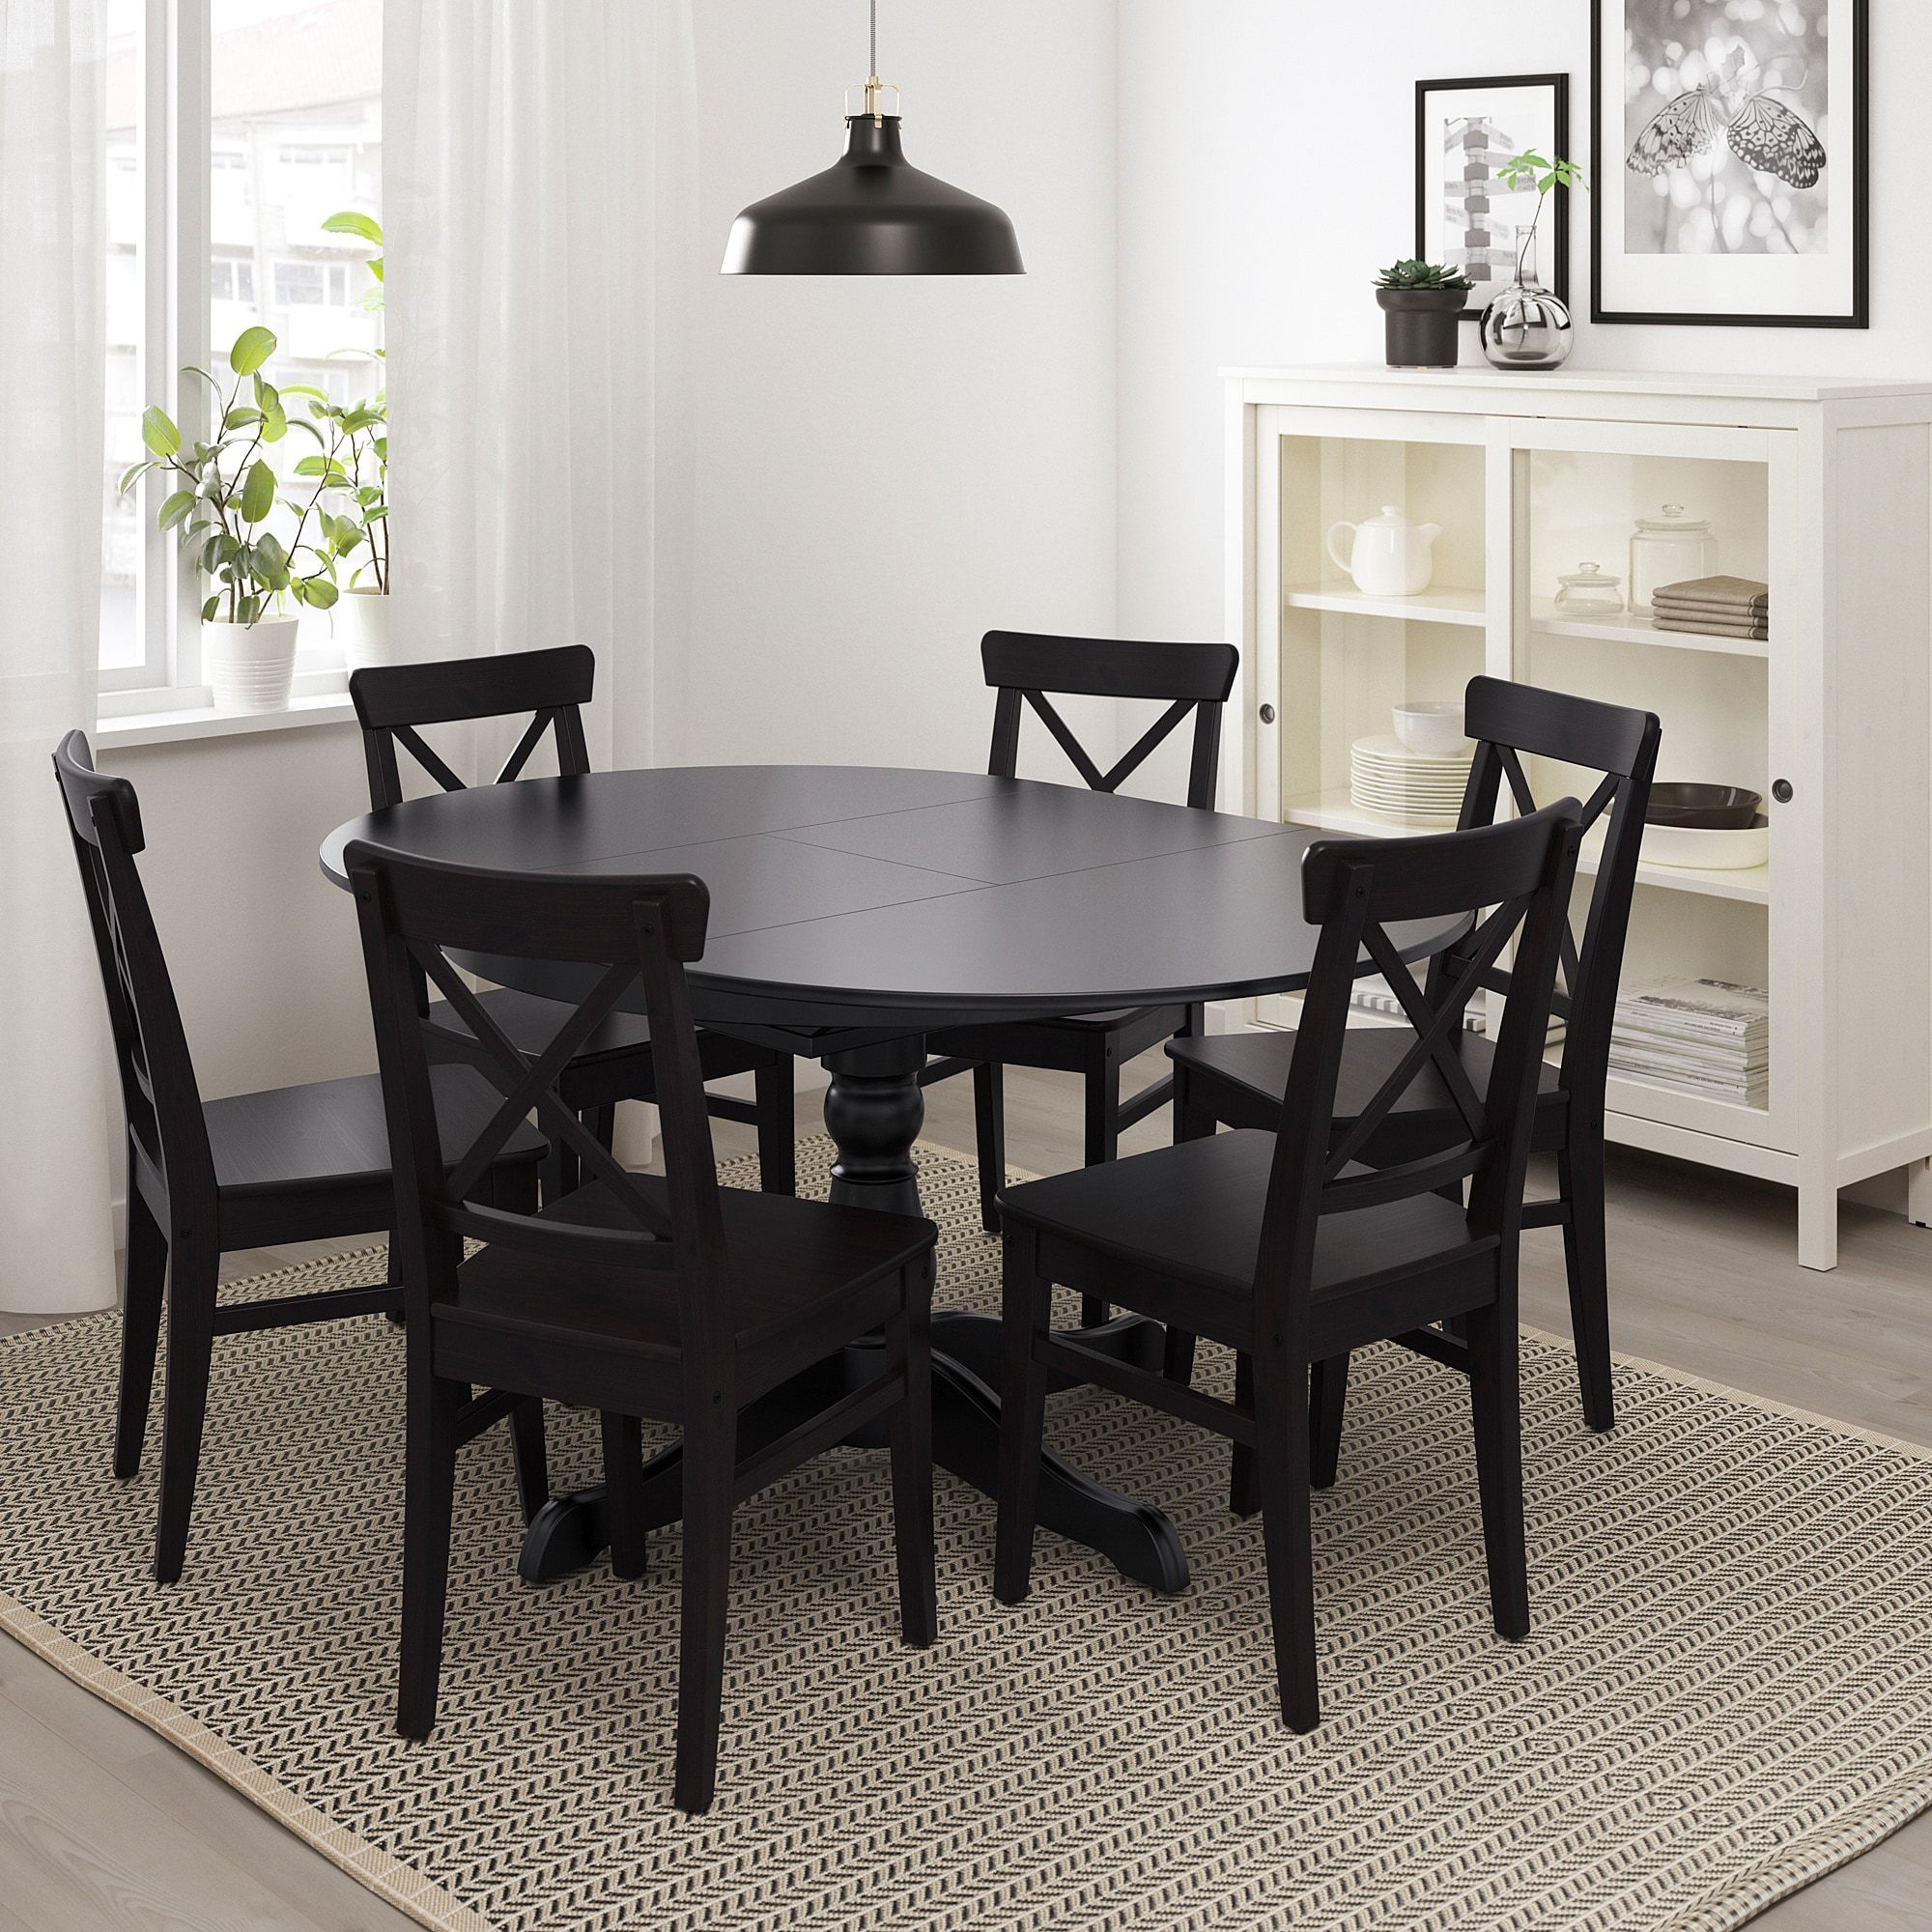 INGATORP Extendable table, black, Max. length 9